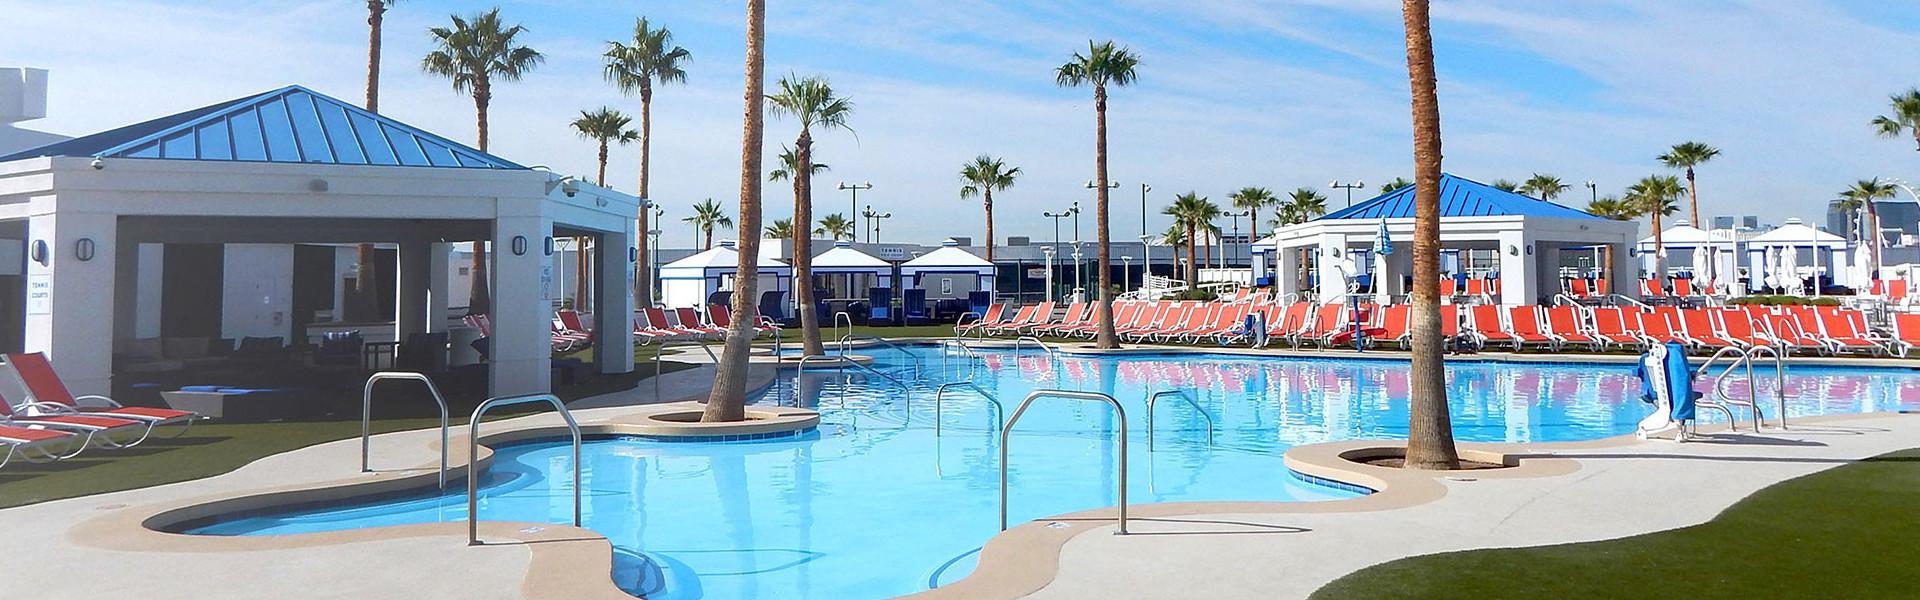 Plentiful Amenities at a Las Vegas Monorail Hotel | Westgate Las Vegas Resort & Casino